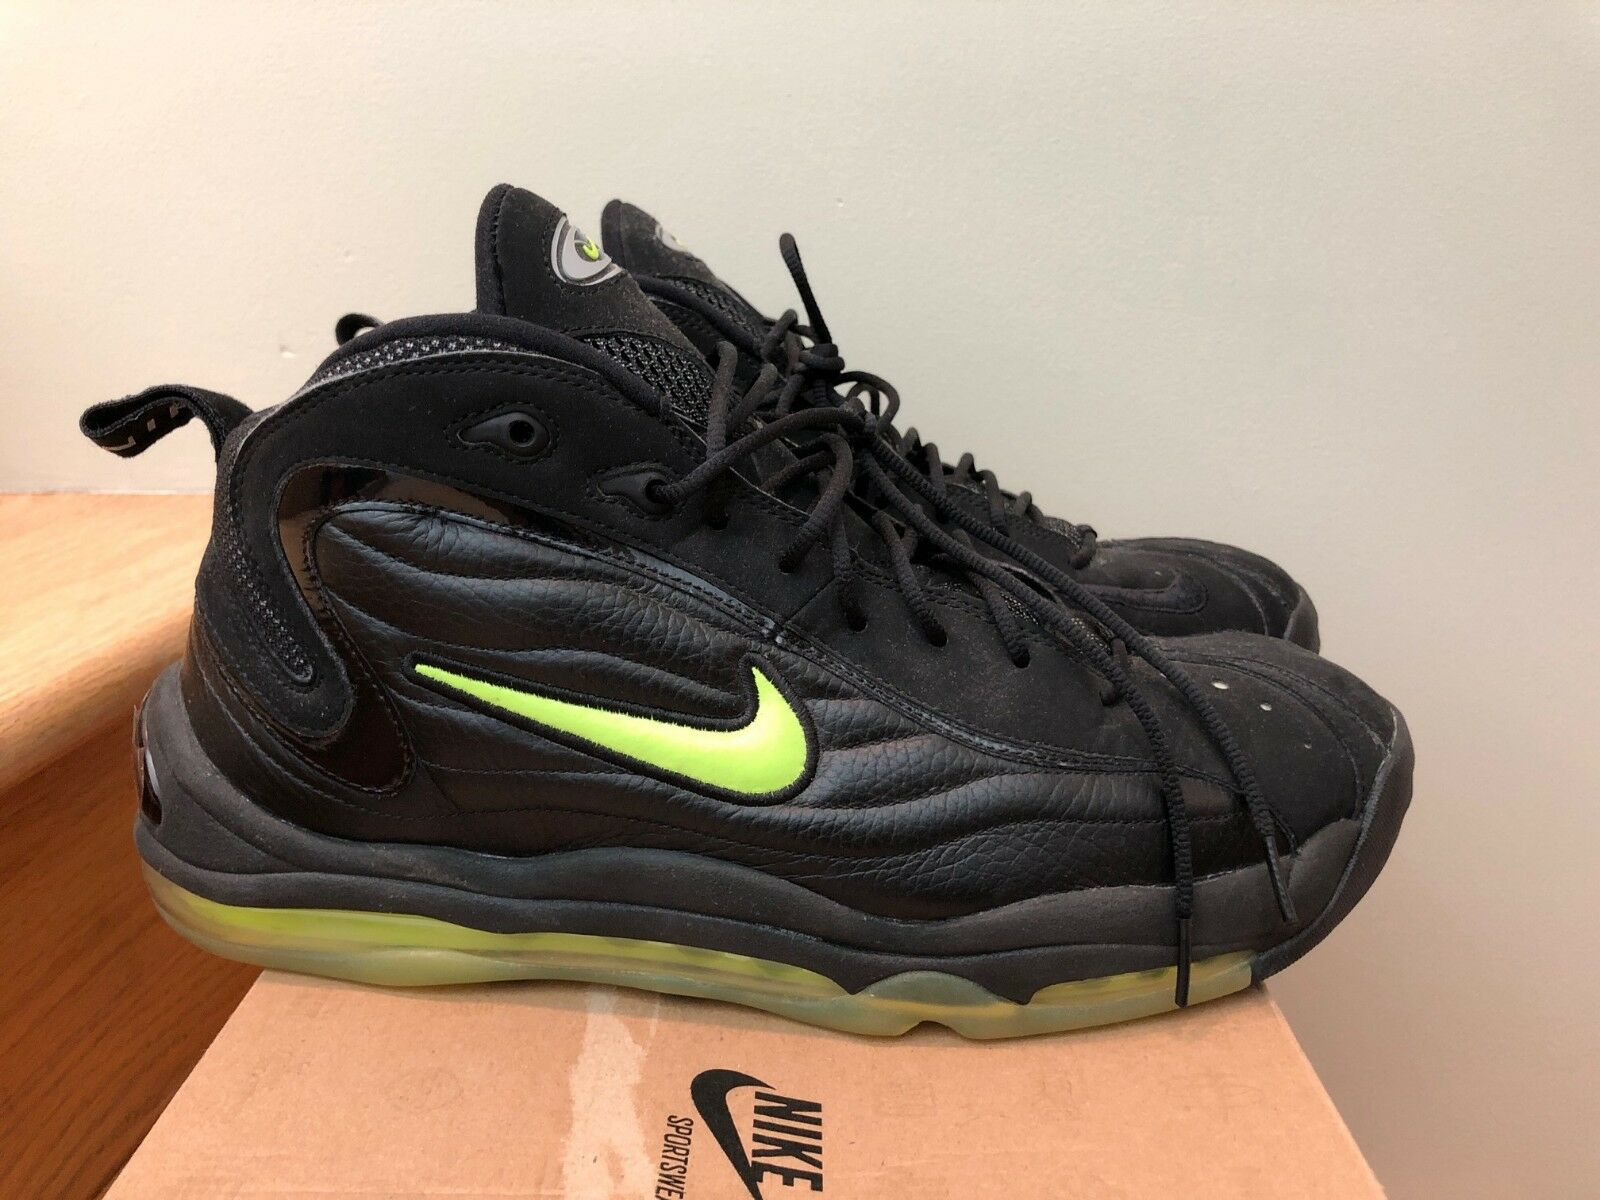 2009 Nike Air Total Total Total Max Uptempo LE Black Volt size 13 0c01dc